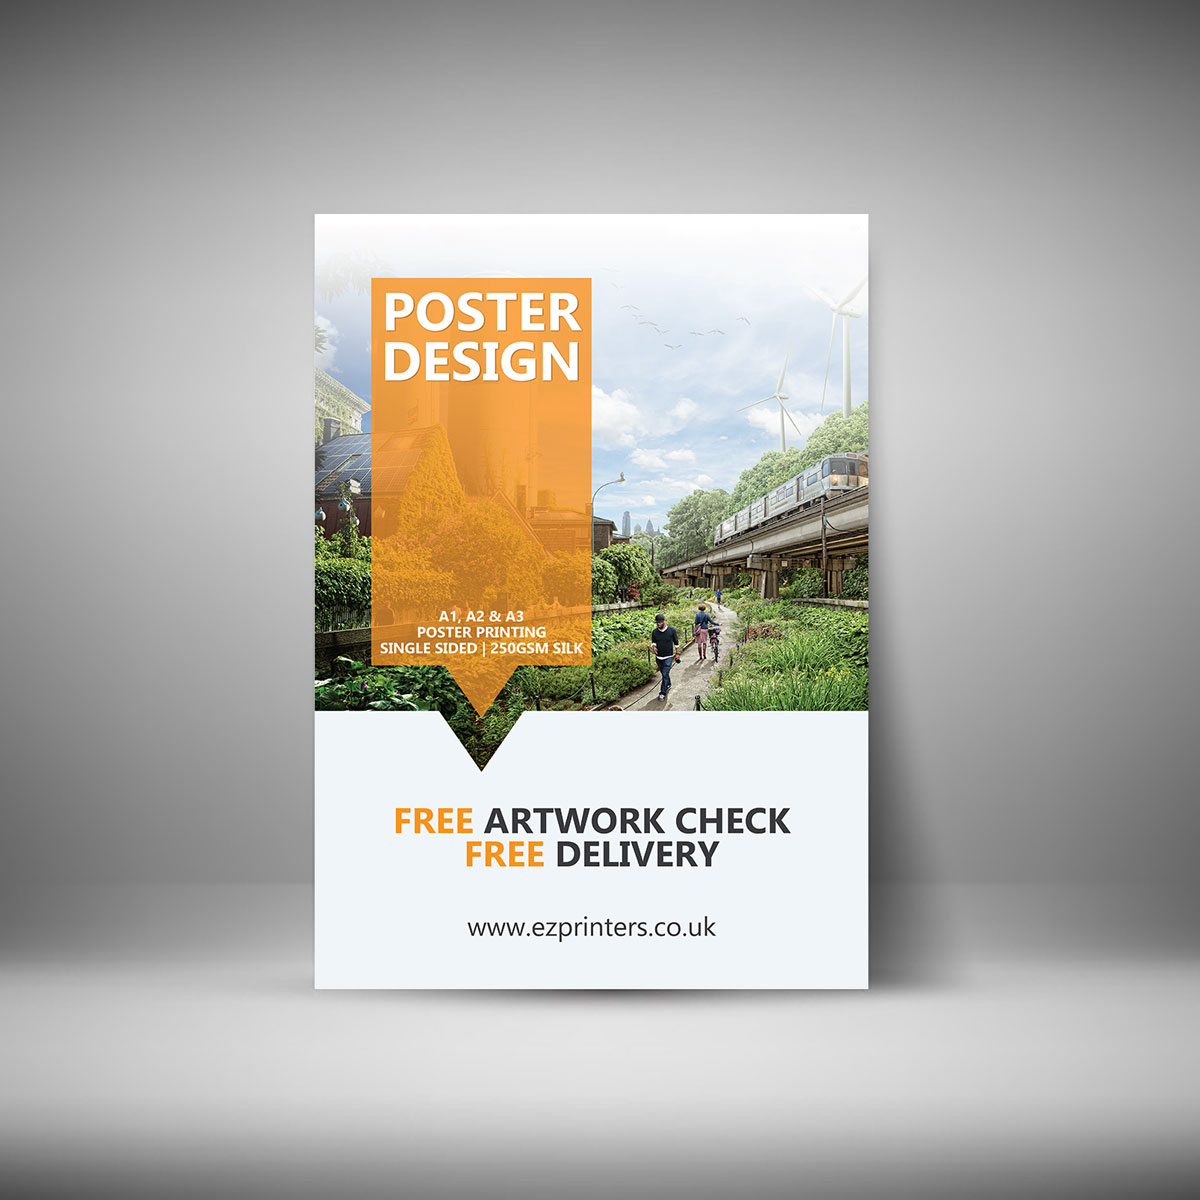 best a3 poster printing company london ec3 near me